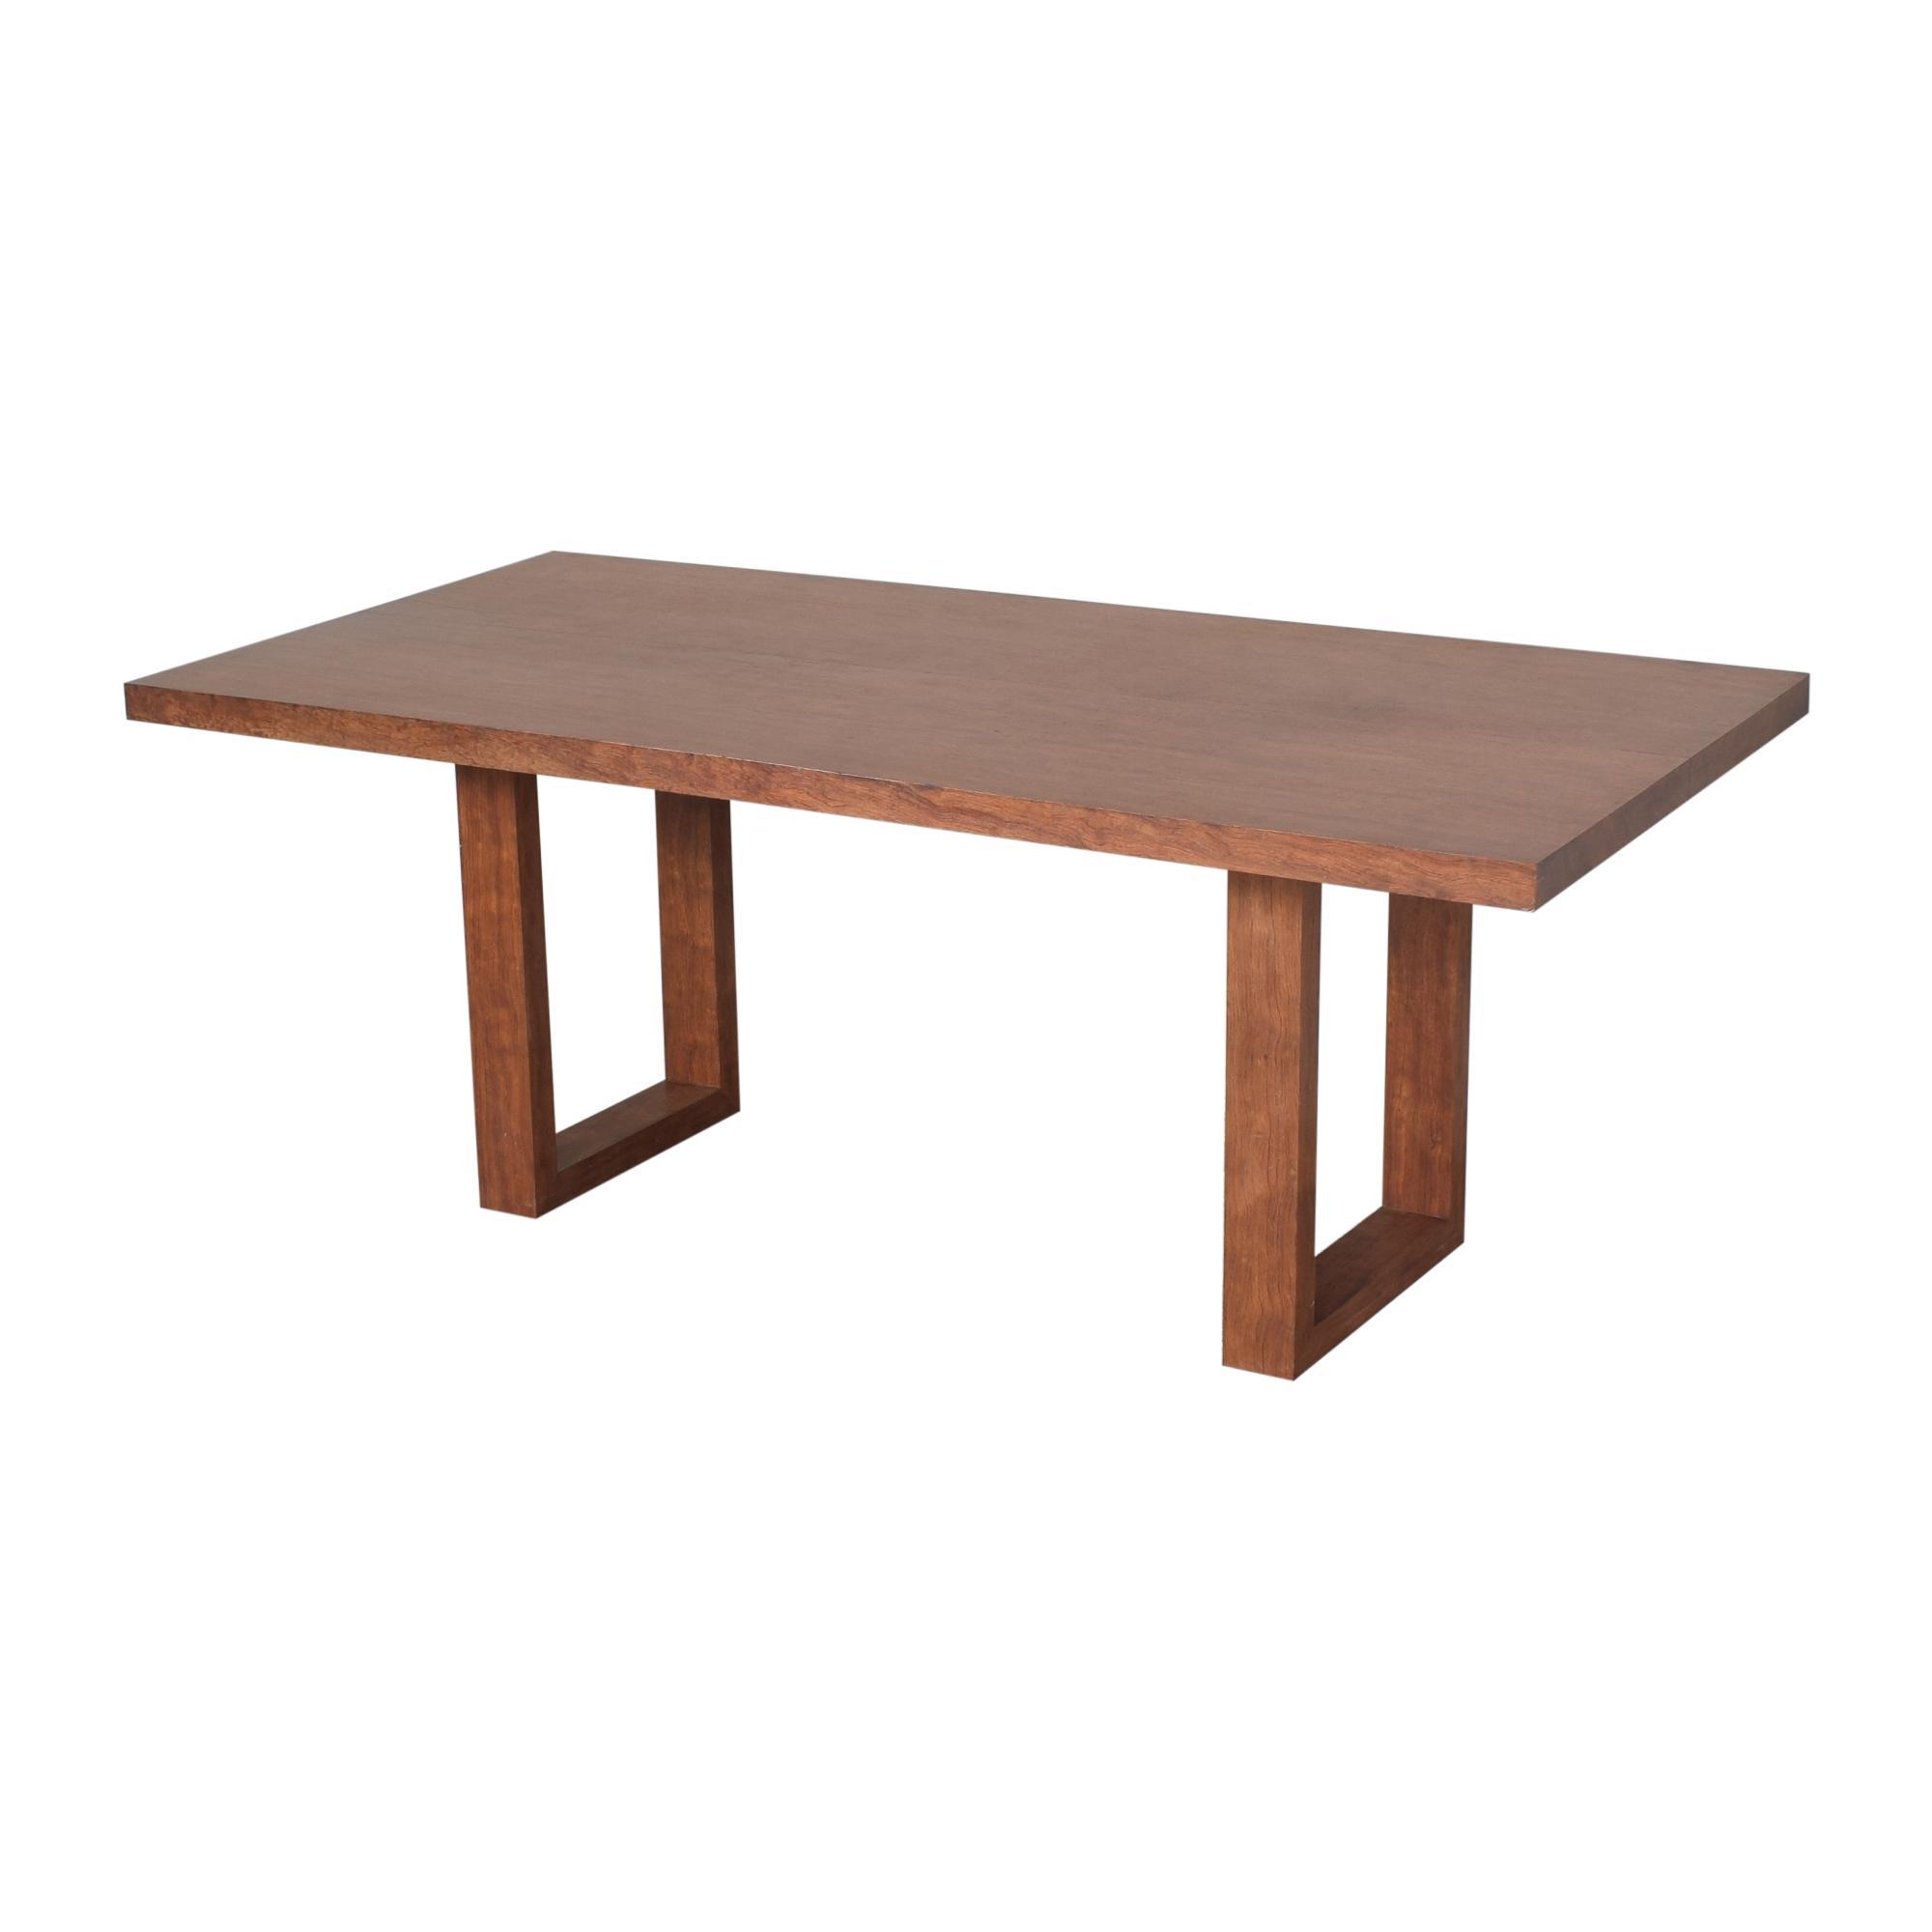 Custom Made Rectangular Dining Table